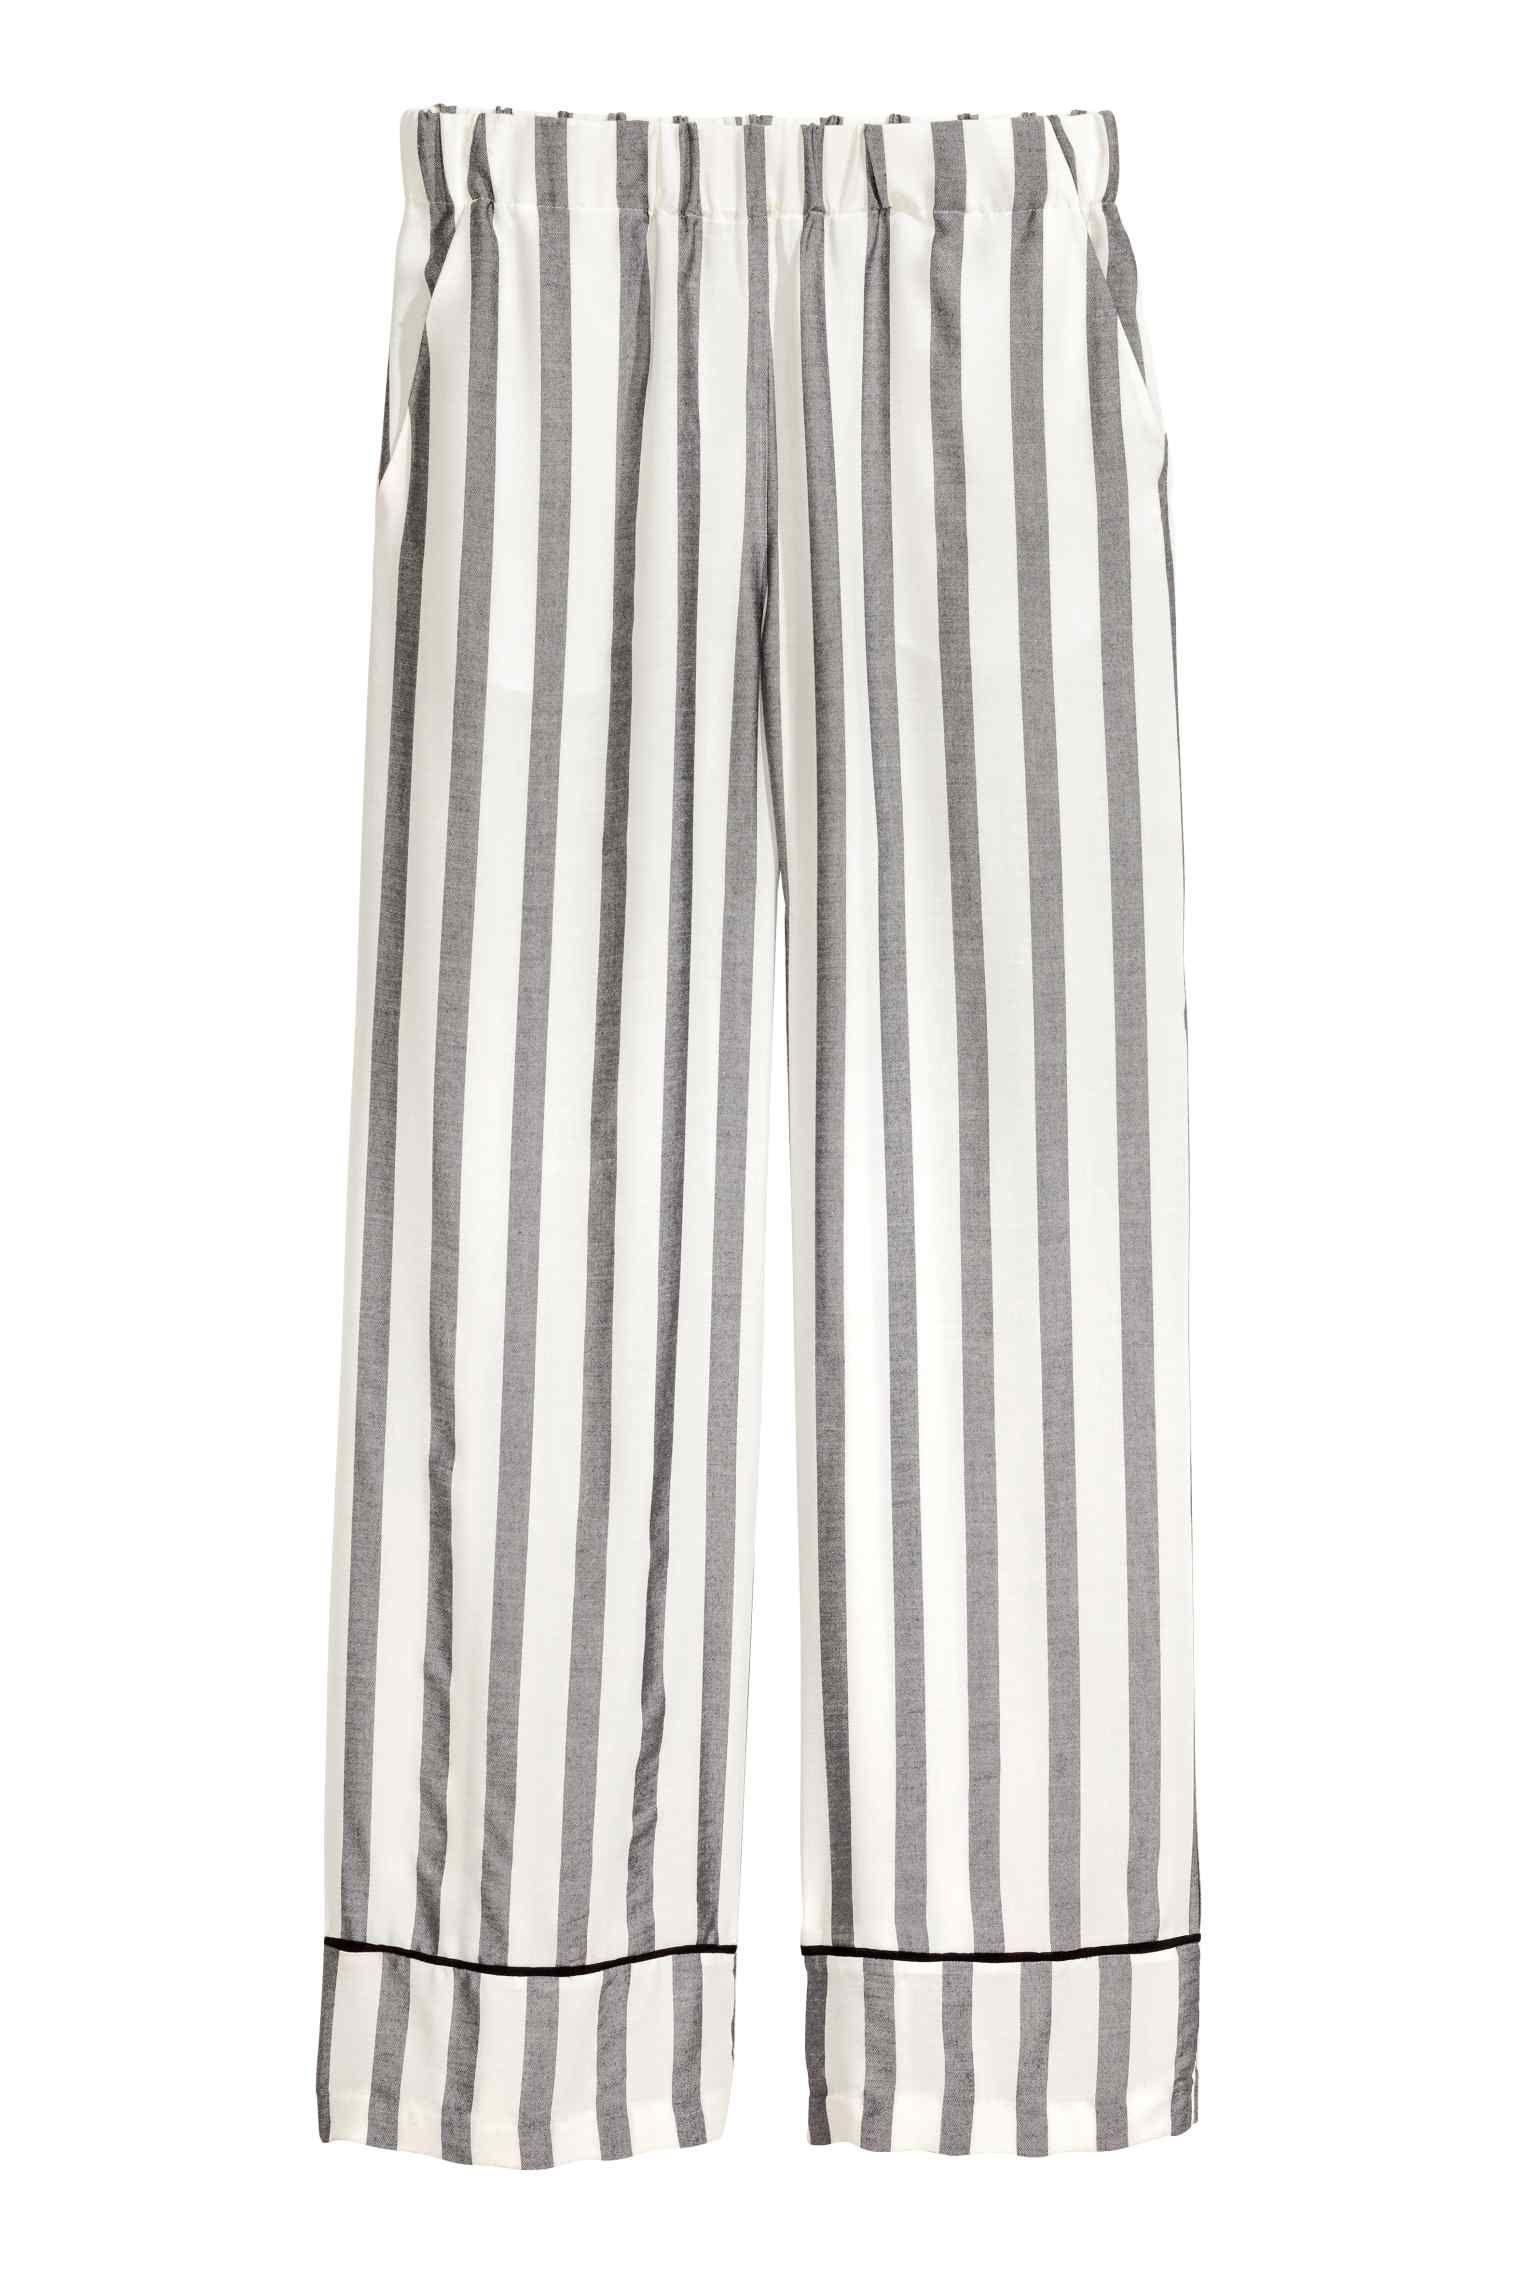 Pantalon ample - Noir/blanc/rayé - FEMME 25€  | H&M FR